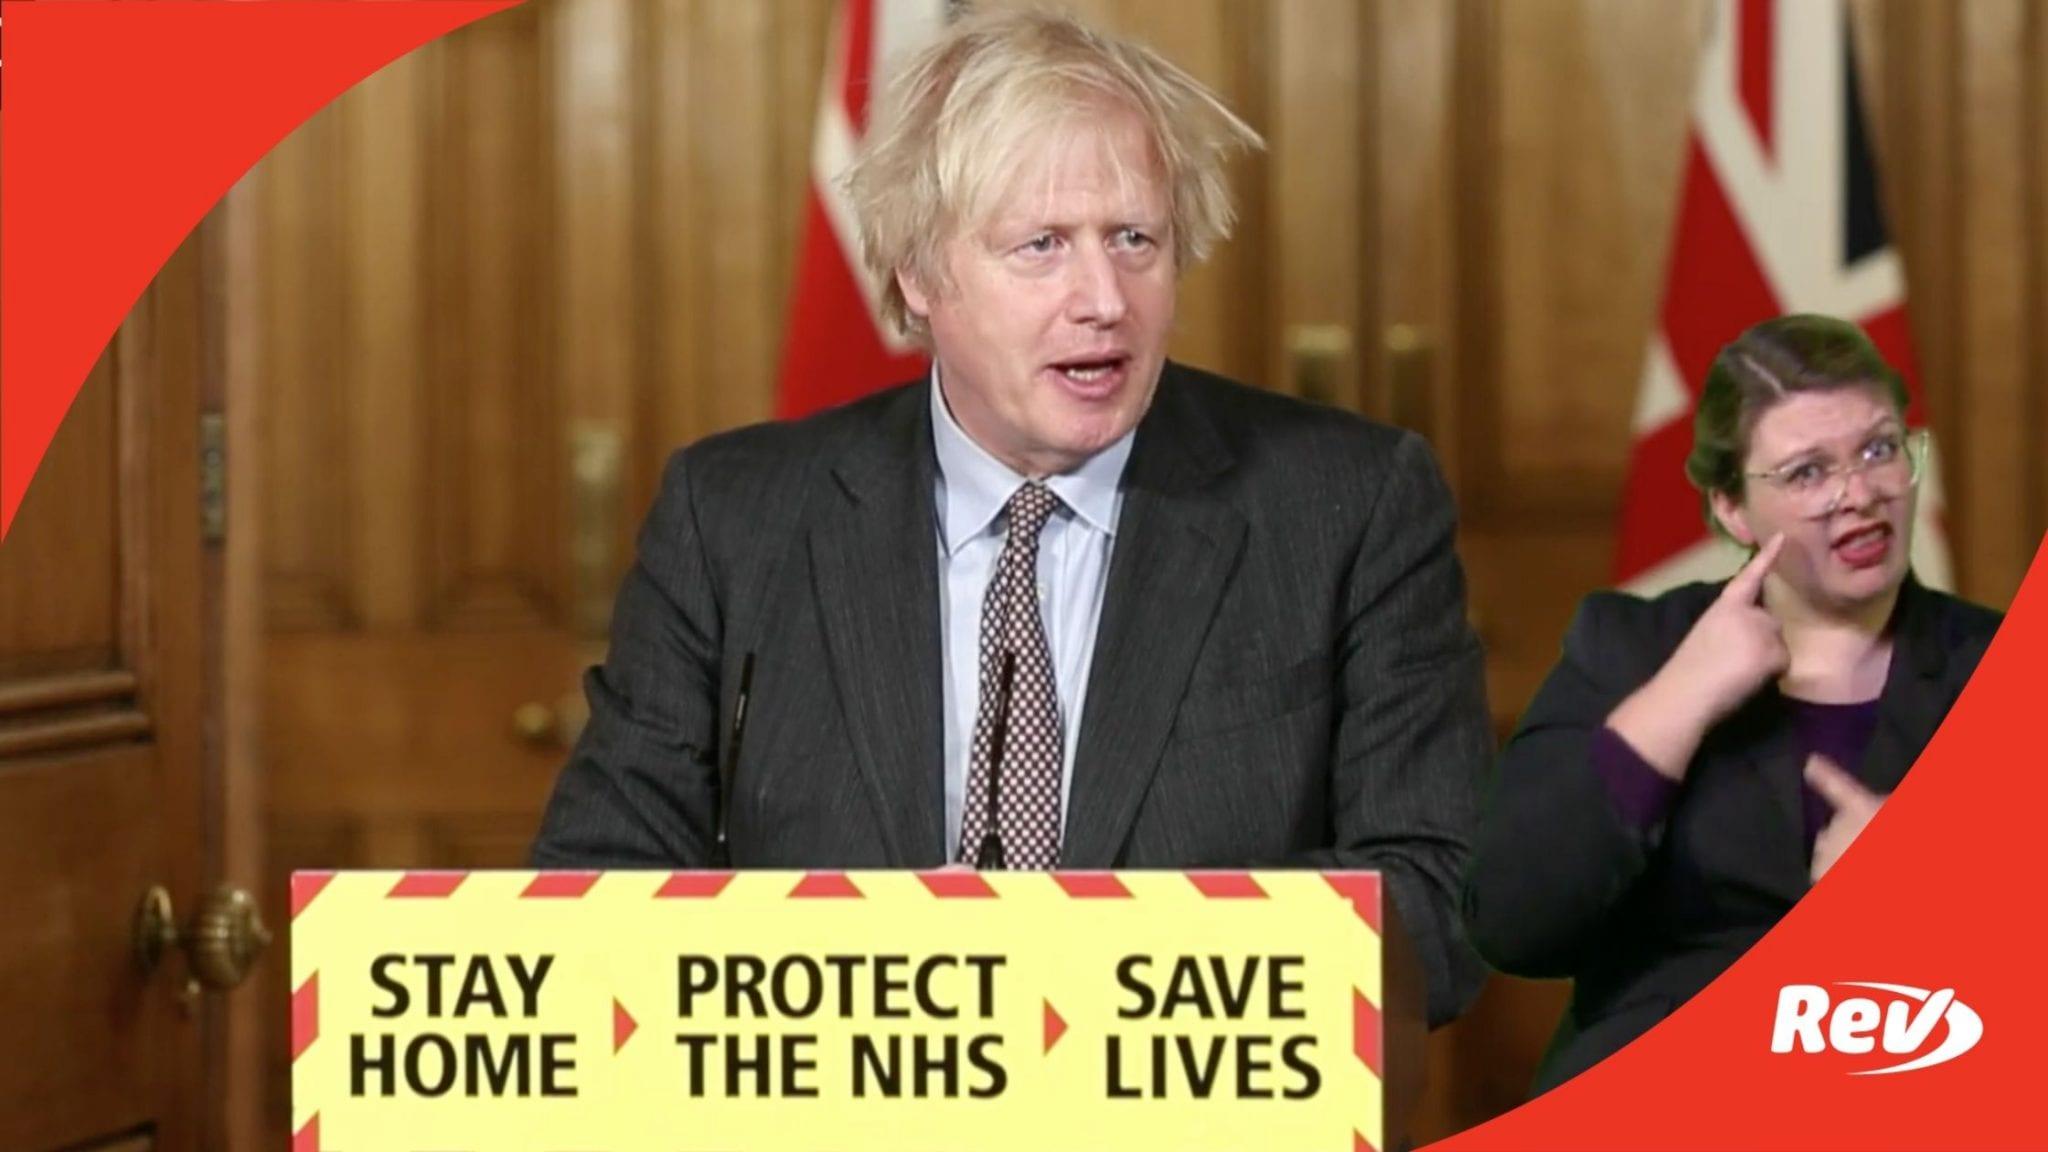 Boris Johnson UK COVID-19 Press Conference Transcript February 22